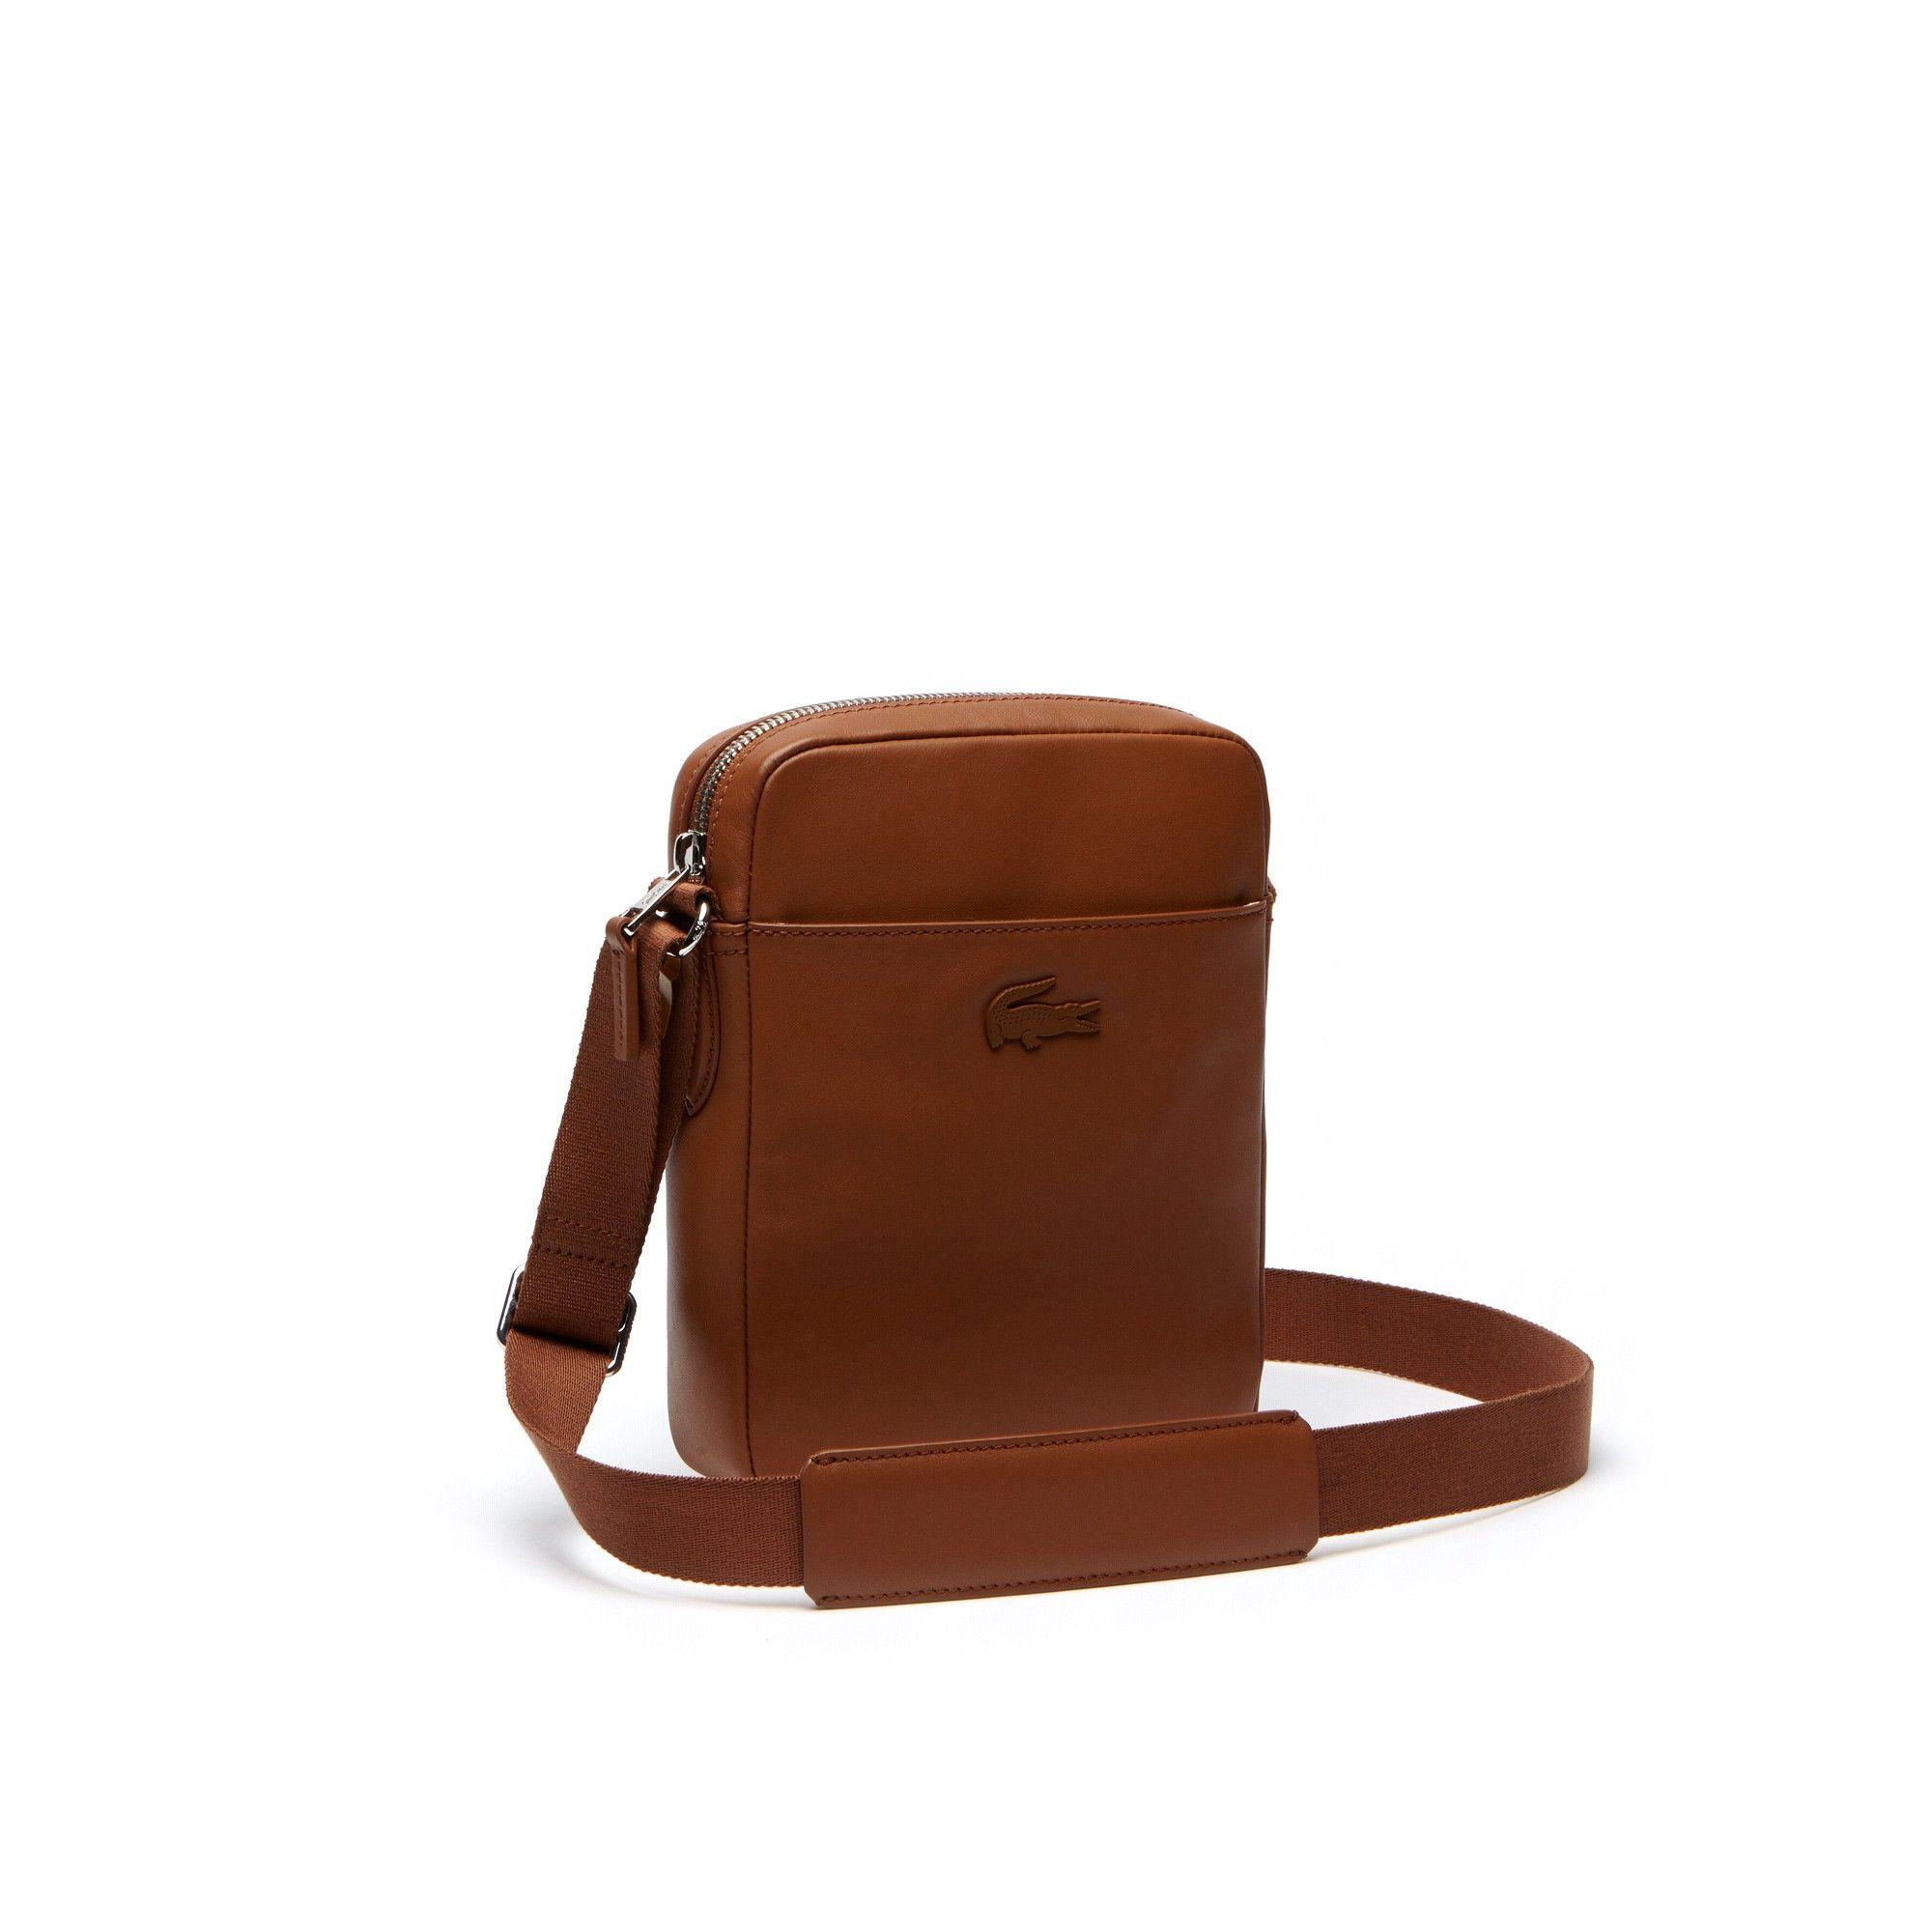 Lacoste menus l business vertical leather bag bison